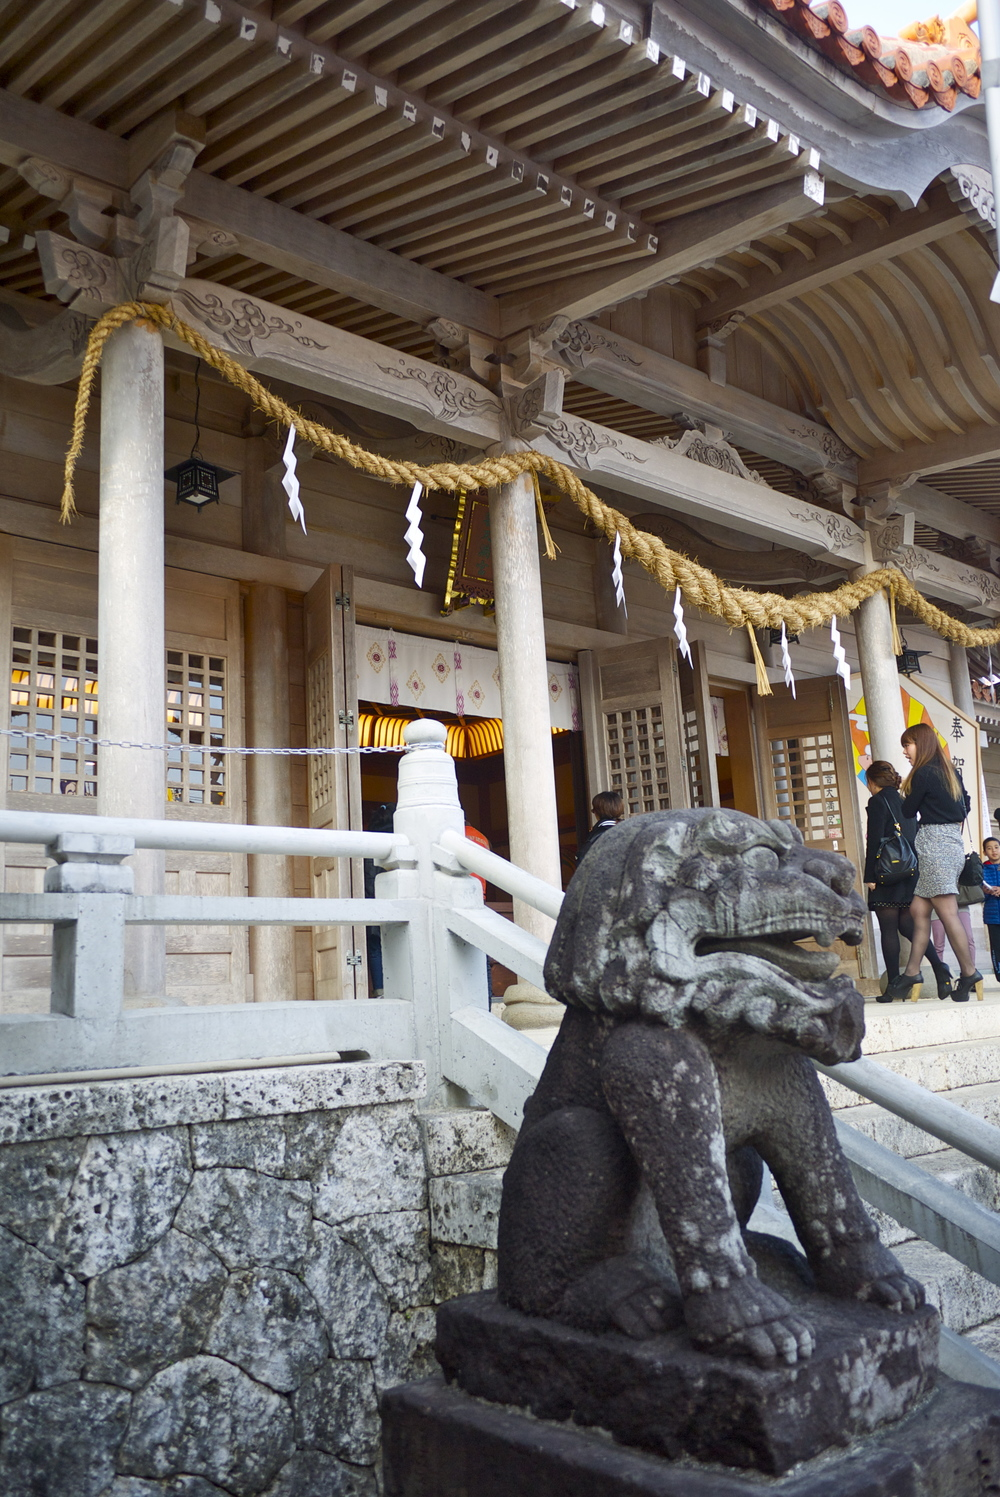 Entry to the Futenma Shrine in Okinawa